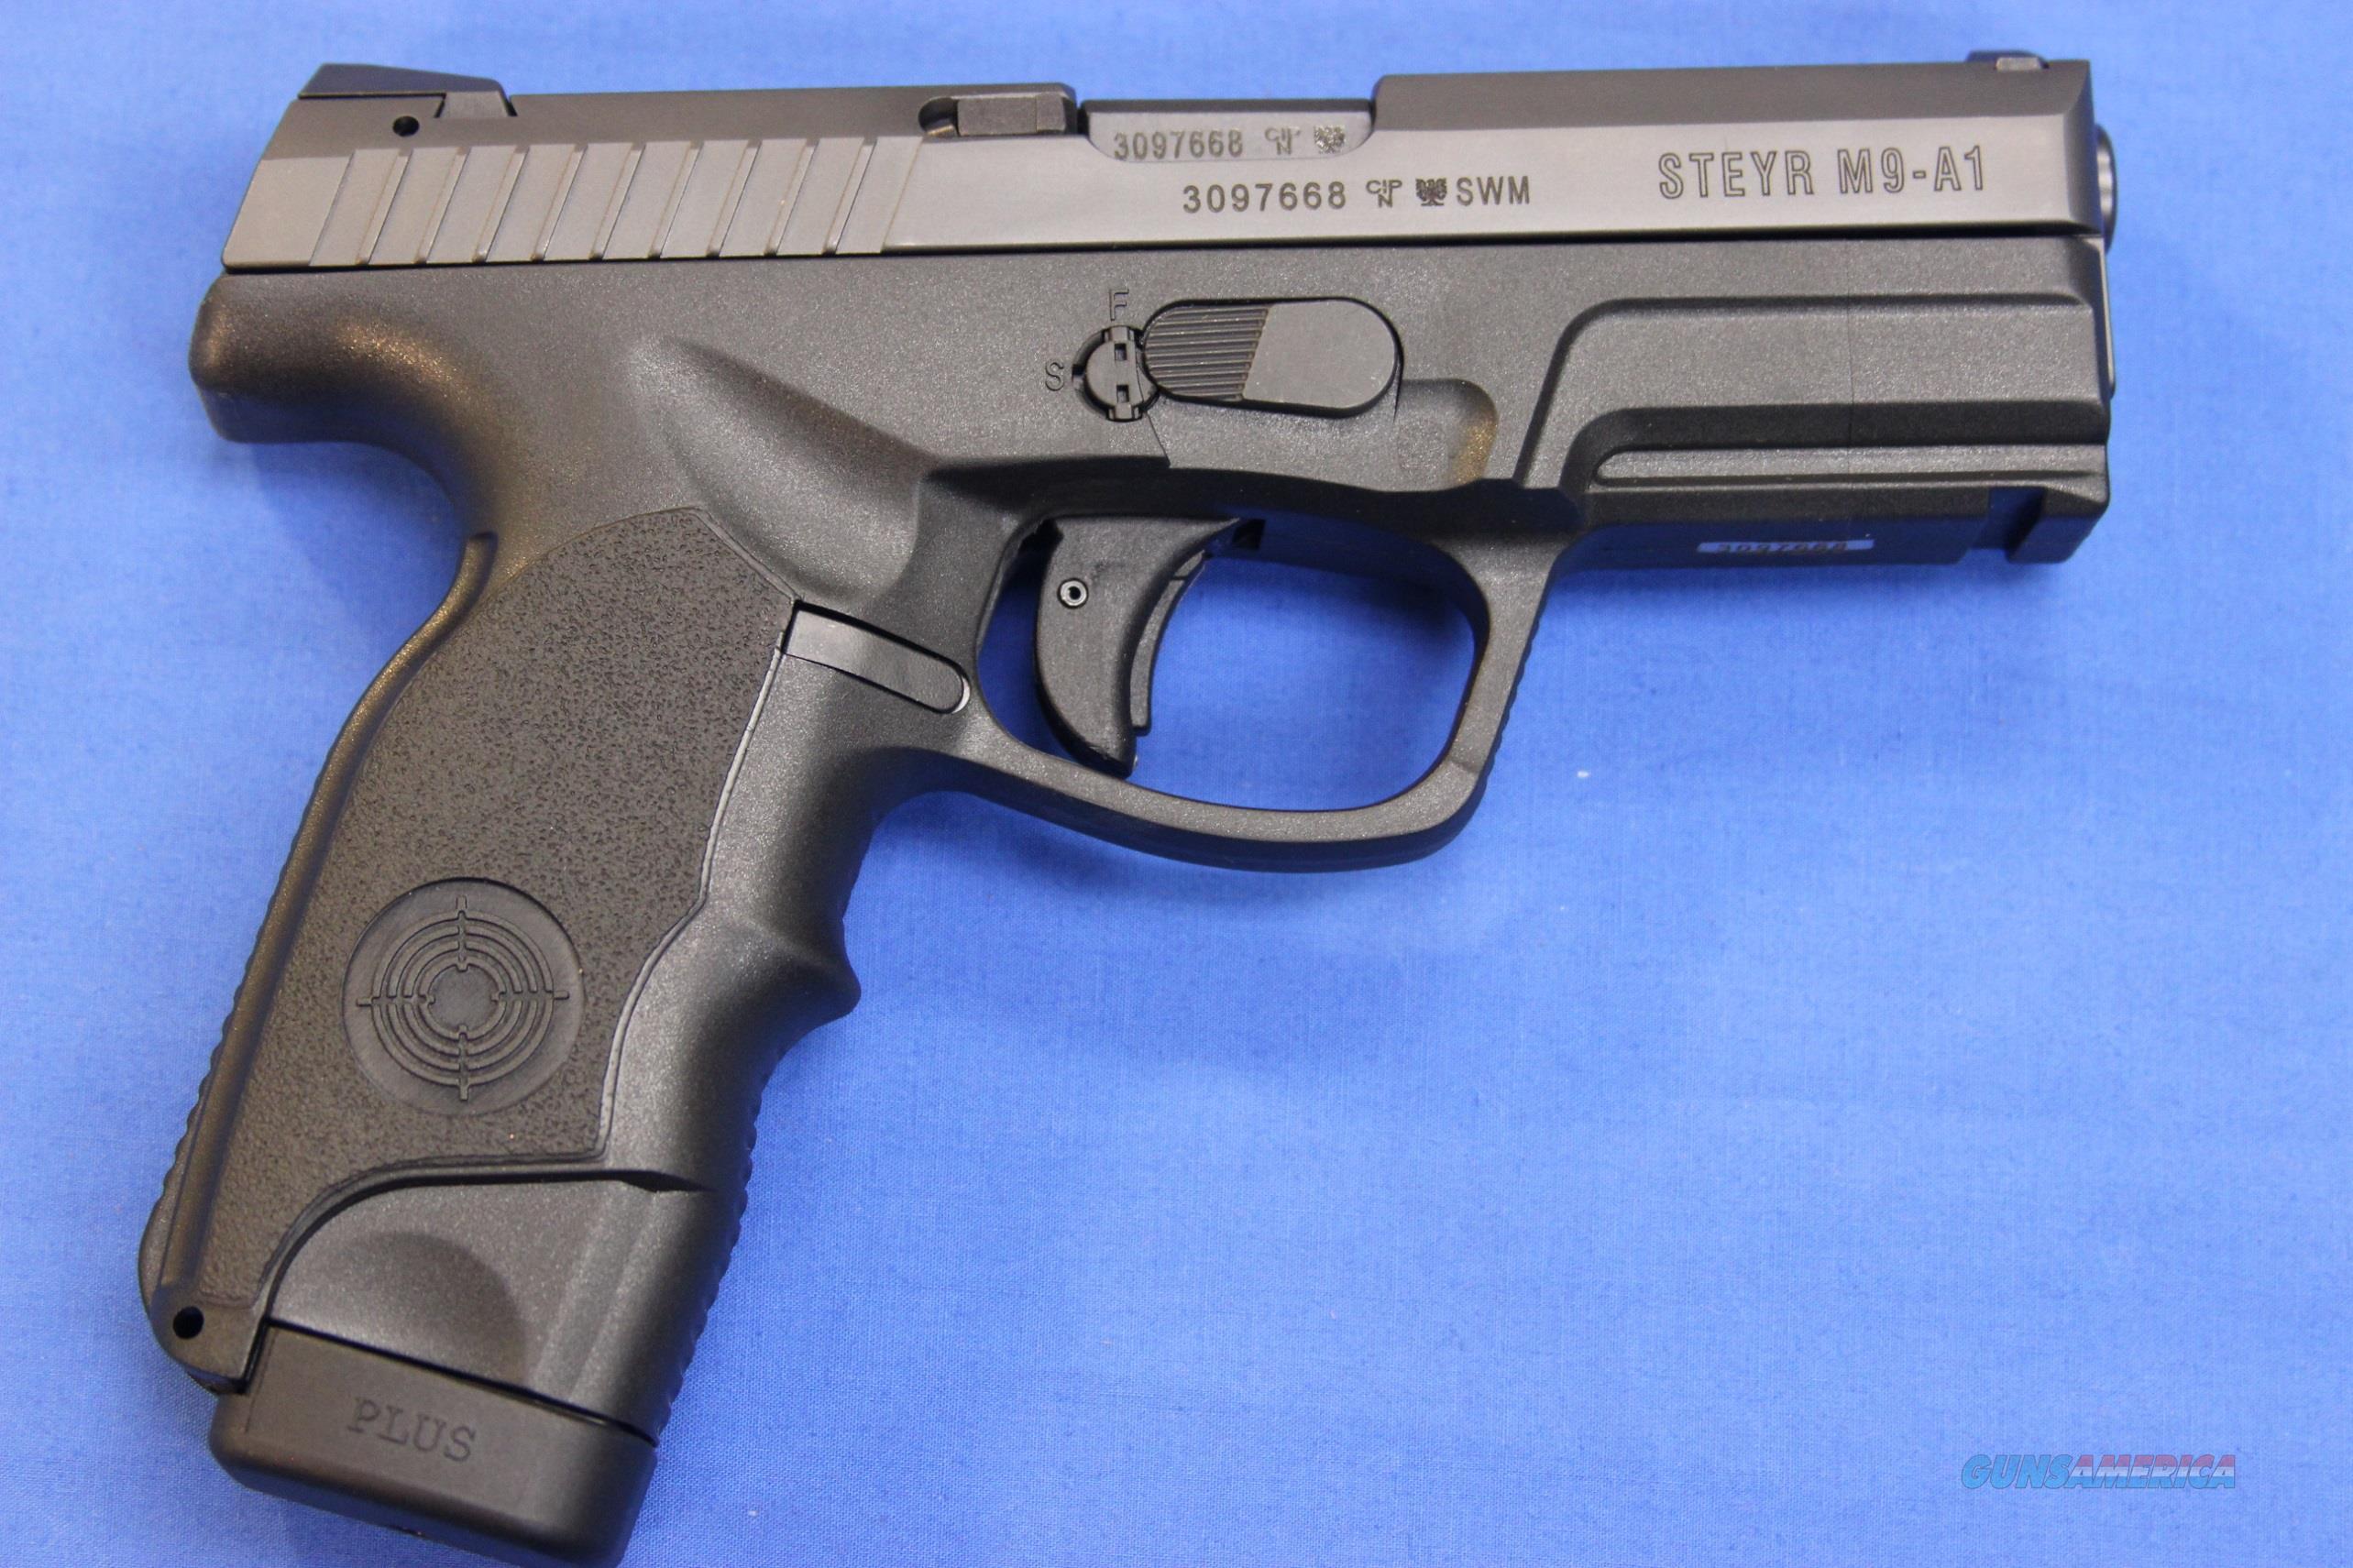 STEYR M9-A1 9x19 - NEW!